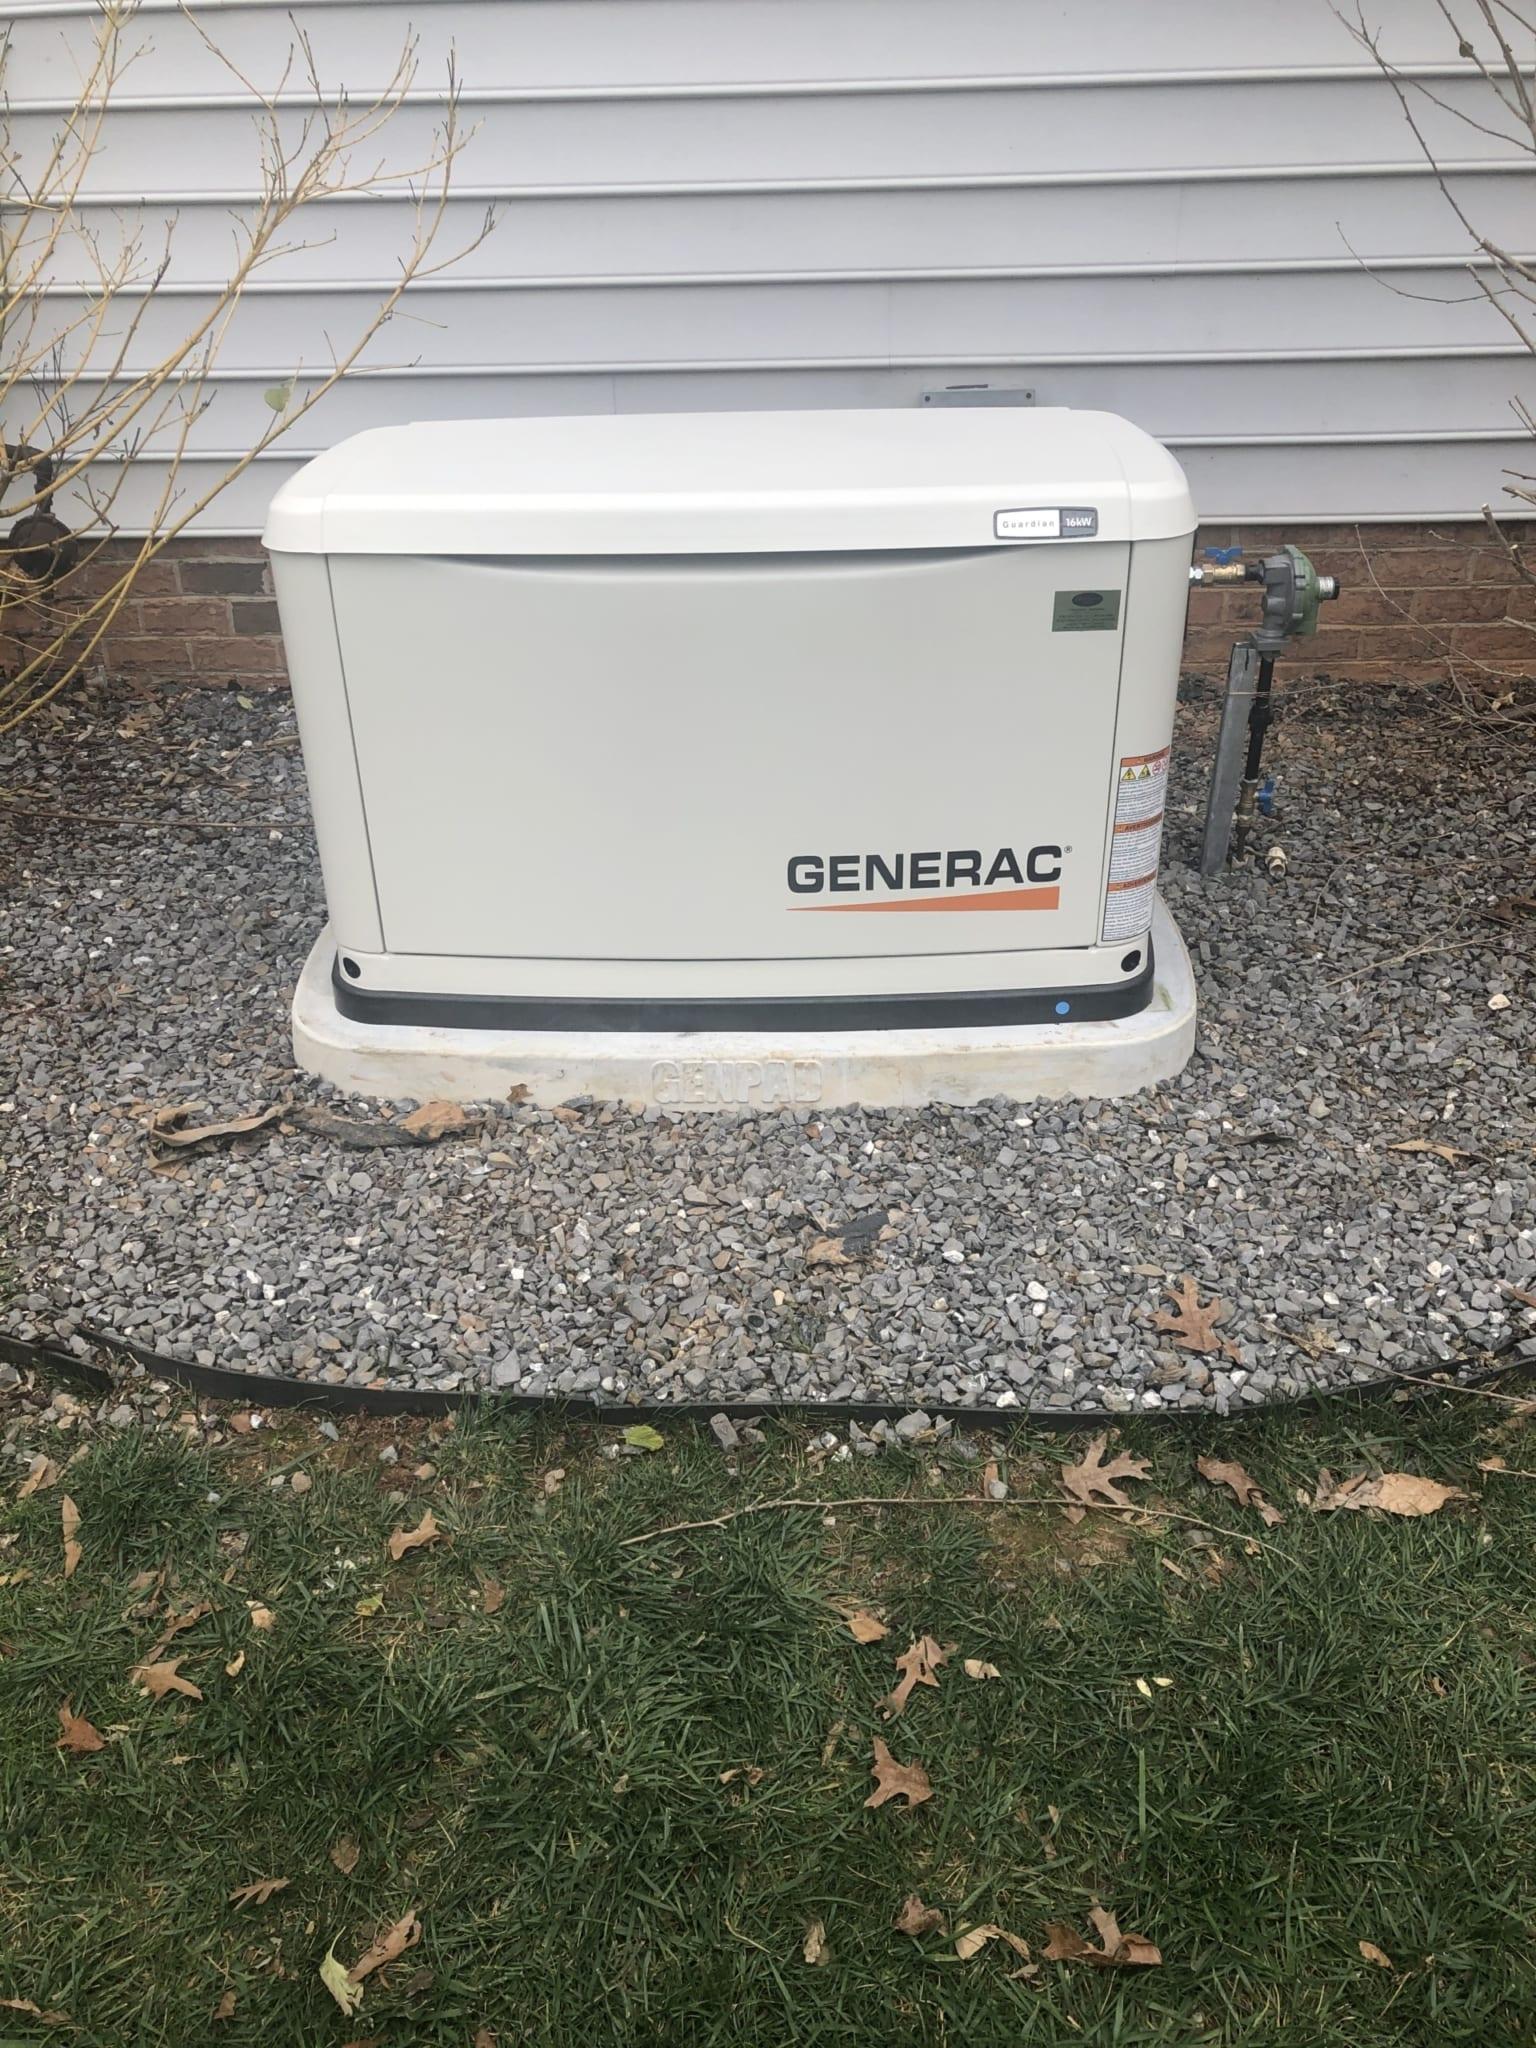 12.4.20 Powhatan Generac Automatic Standby Generator